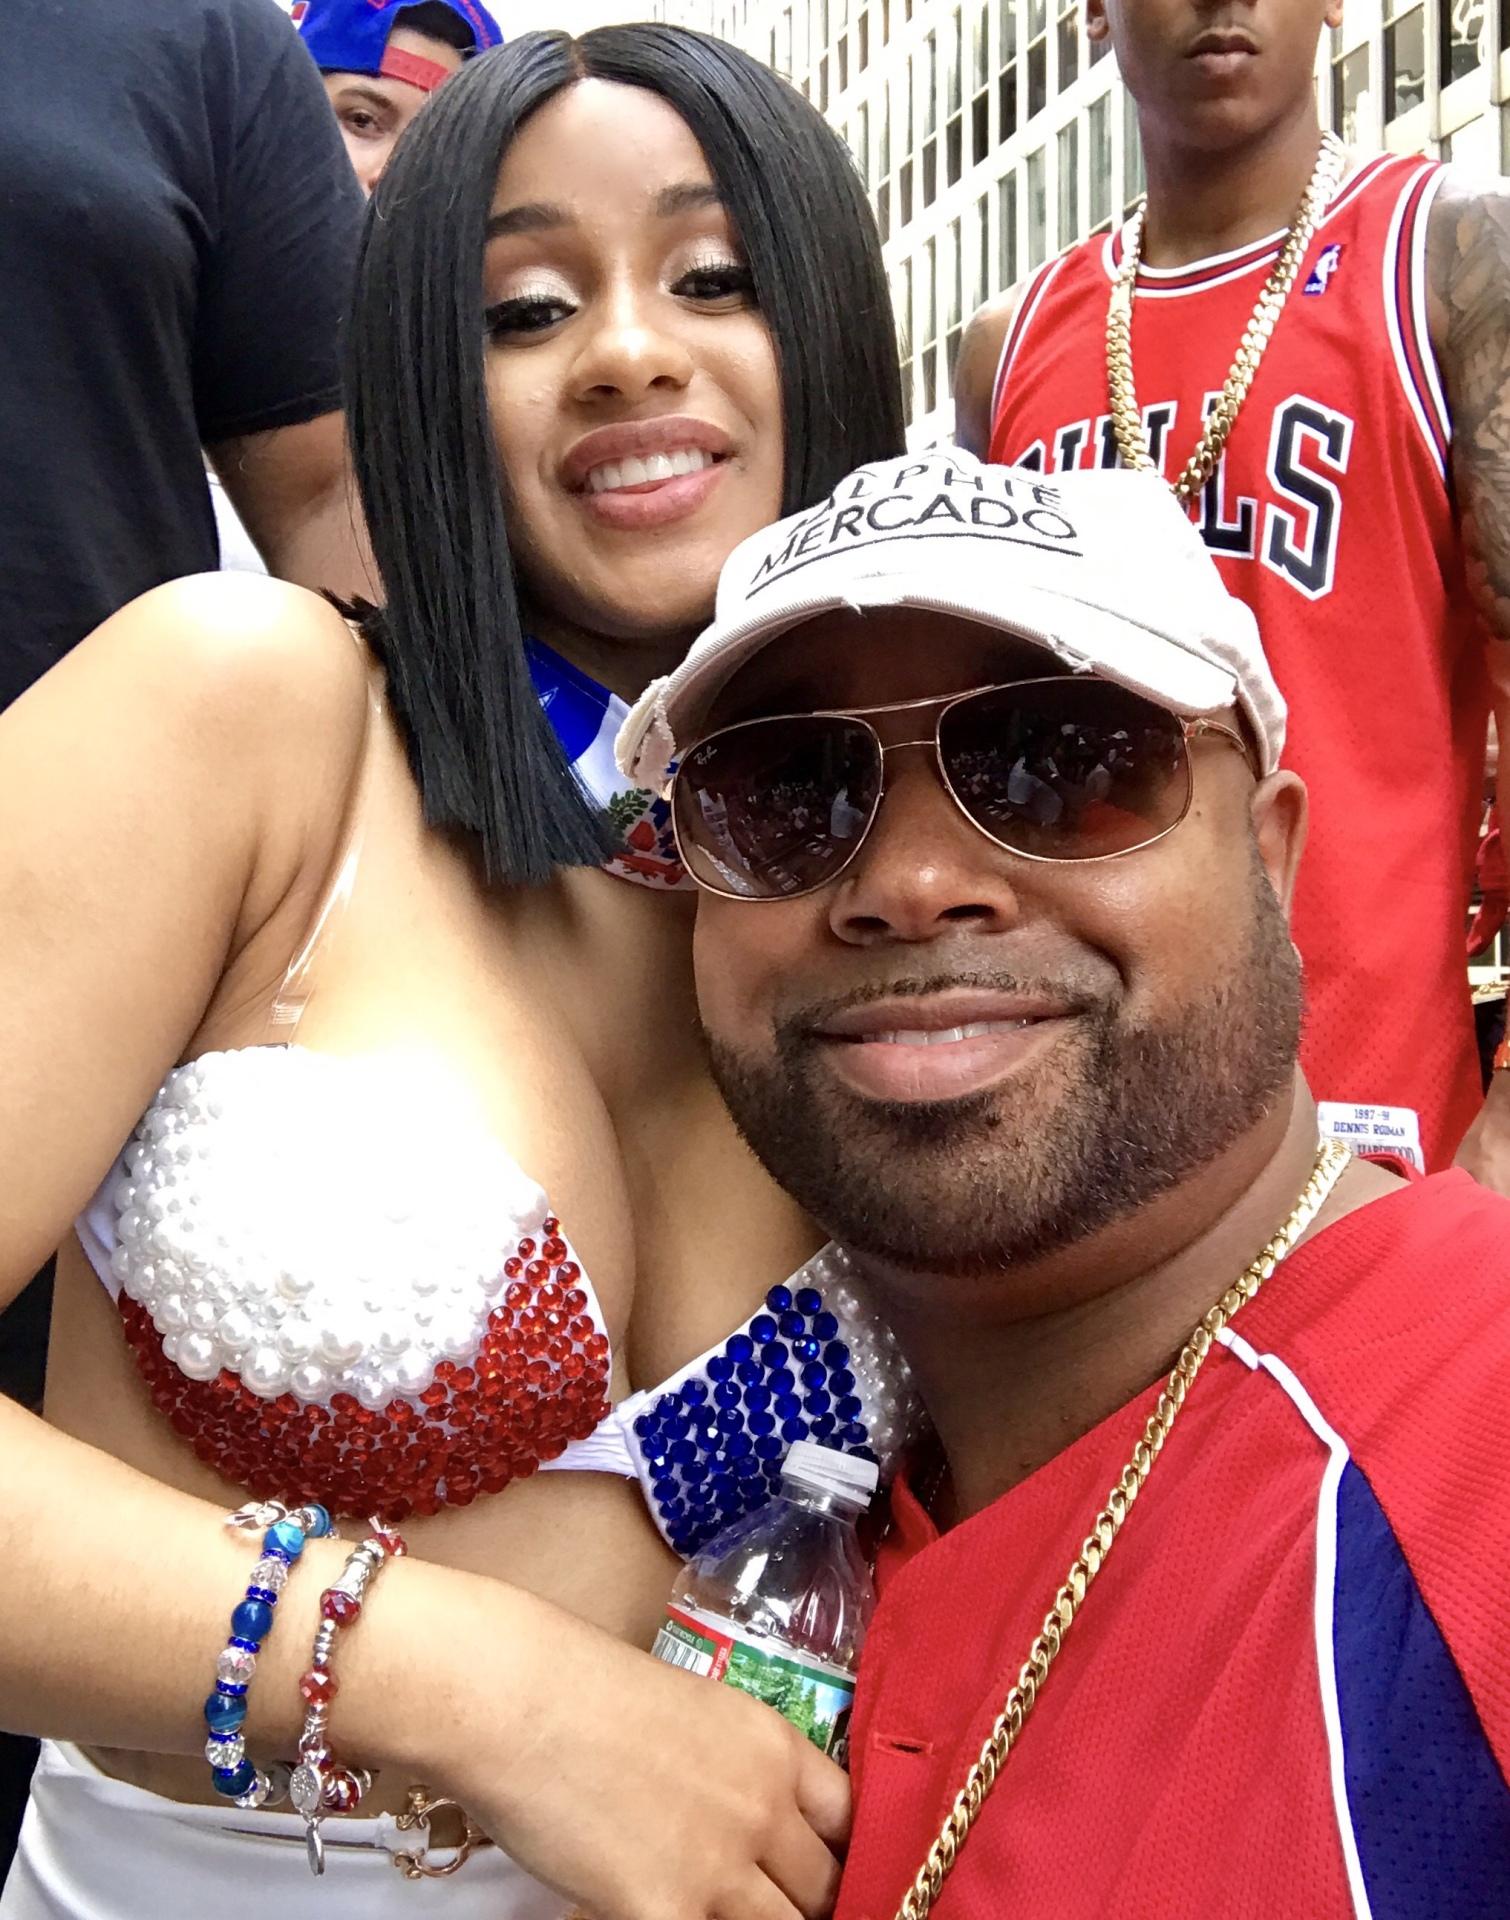 Parada Dominicana Sun. 8-13-17